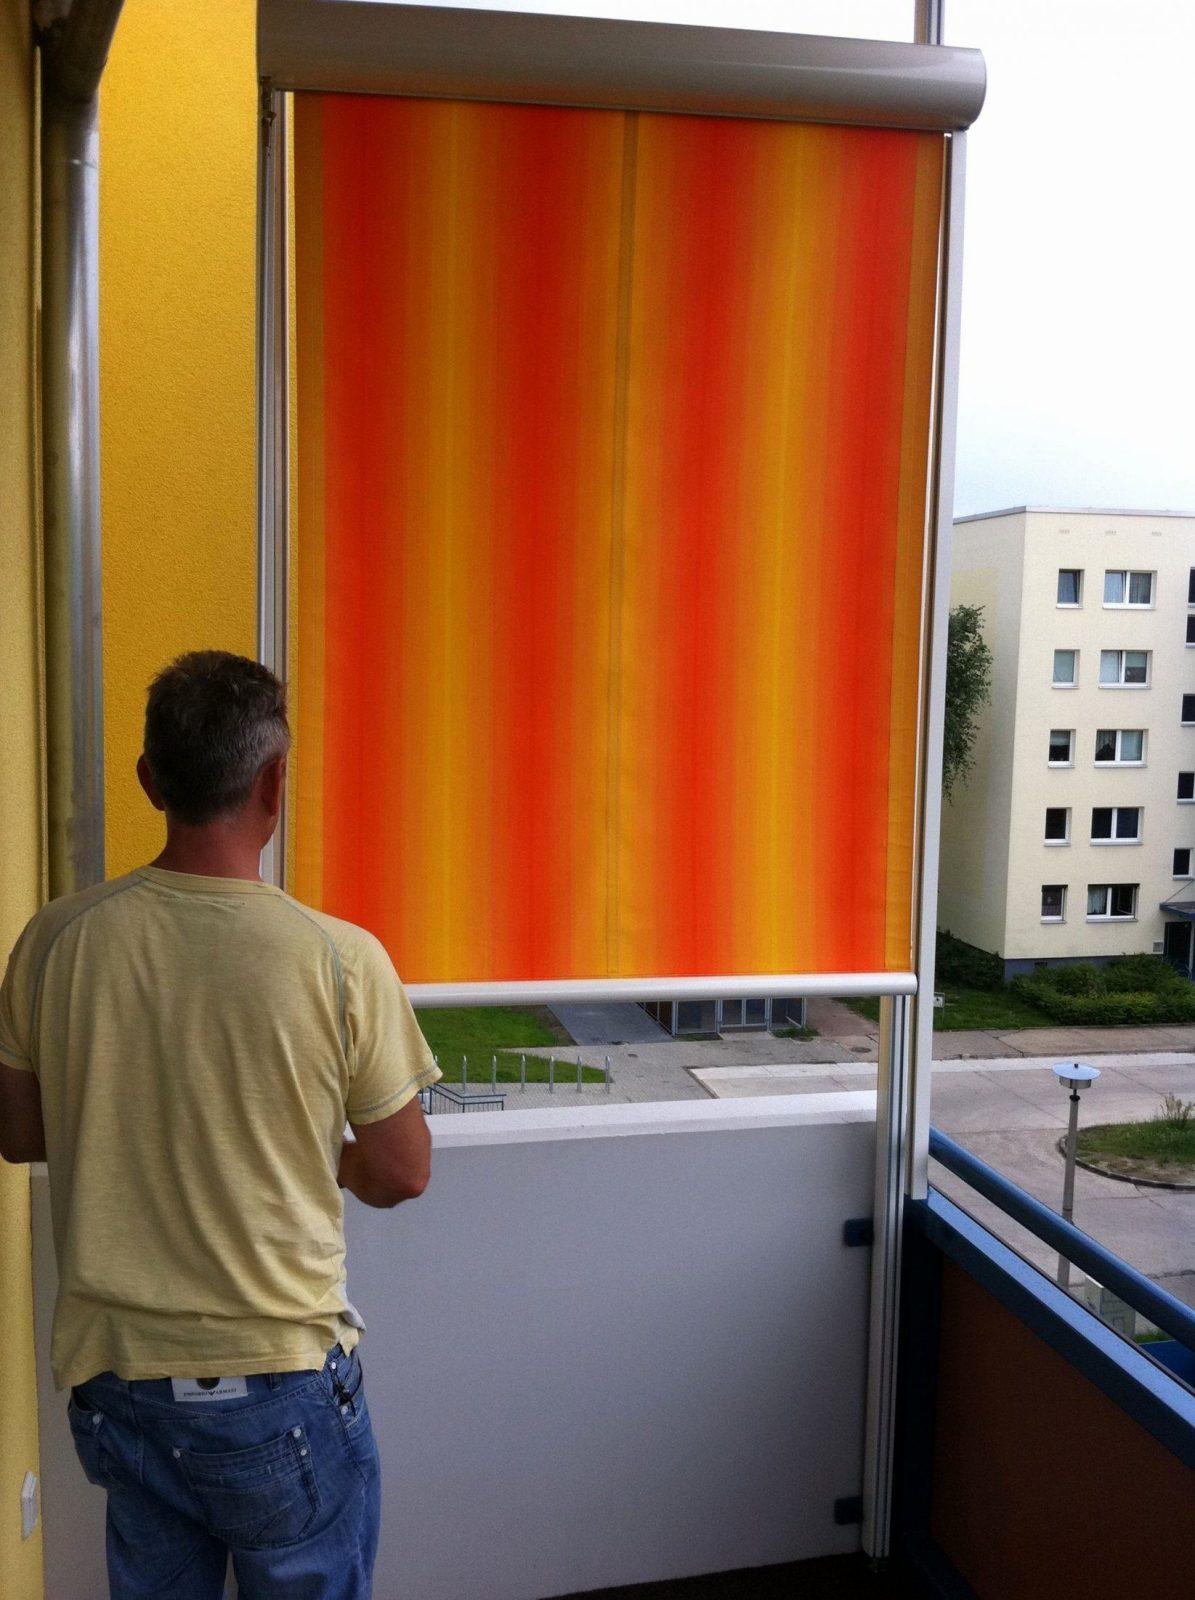 Markisen Ohne Bohren Neu Markise Fr Balkon Ohne Bohren Balkon von Sichtschutz Für Balkon Ohne Bohren Photo